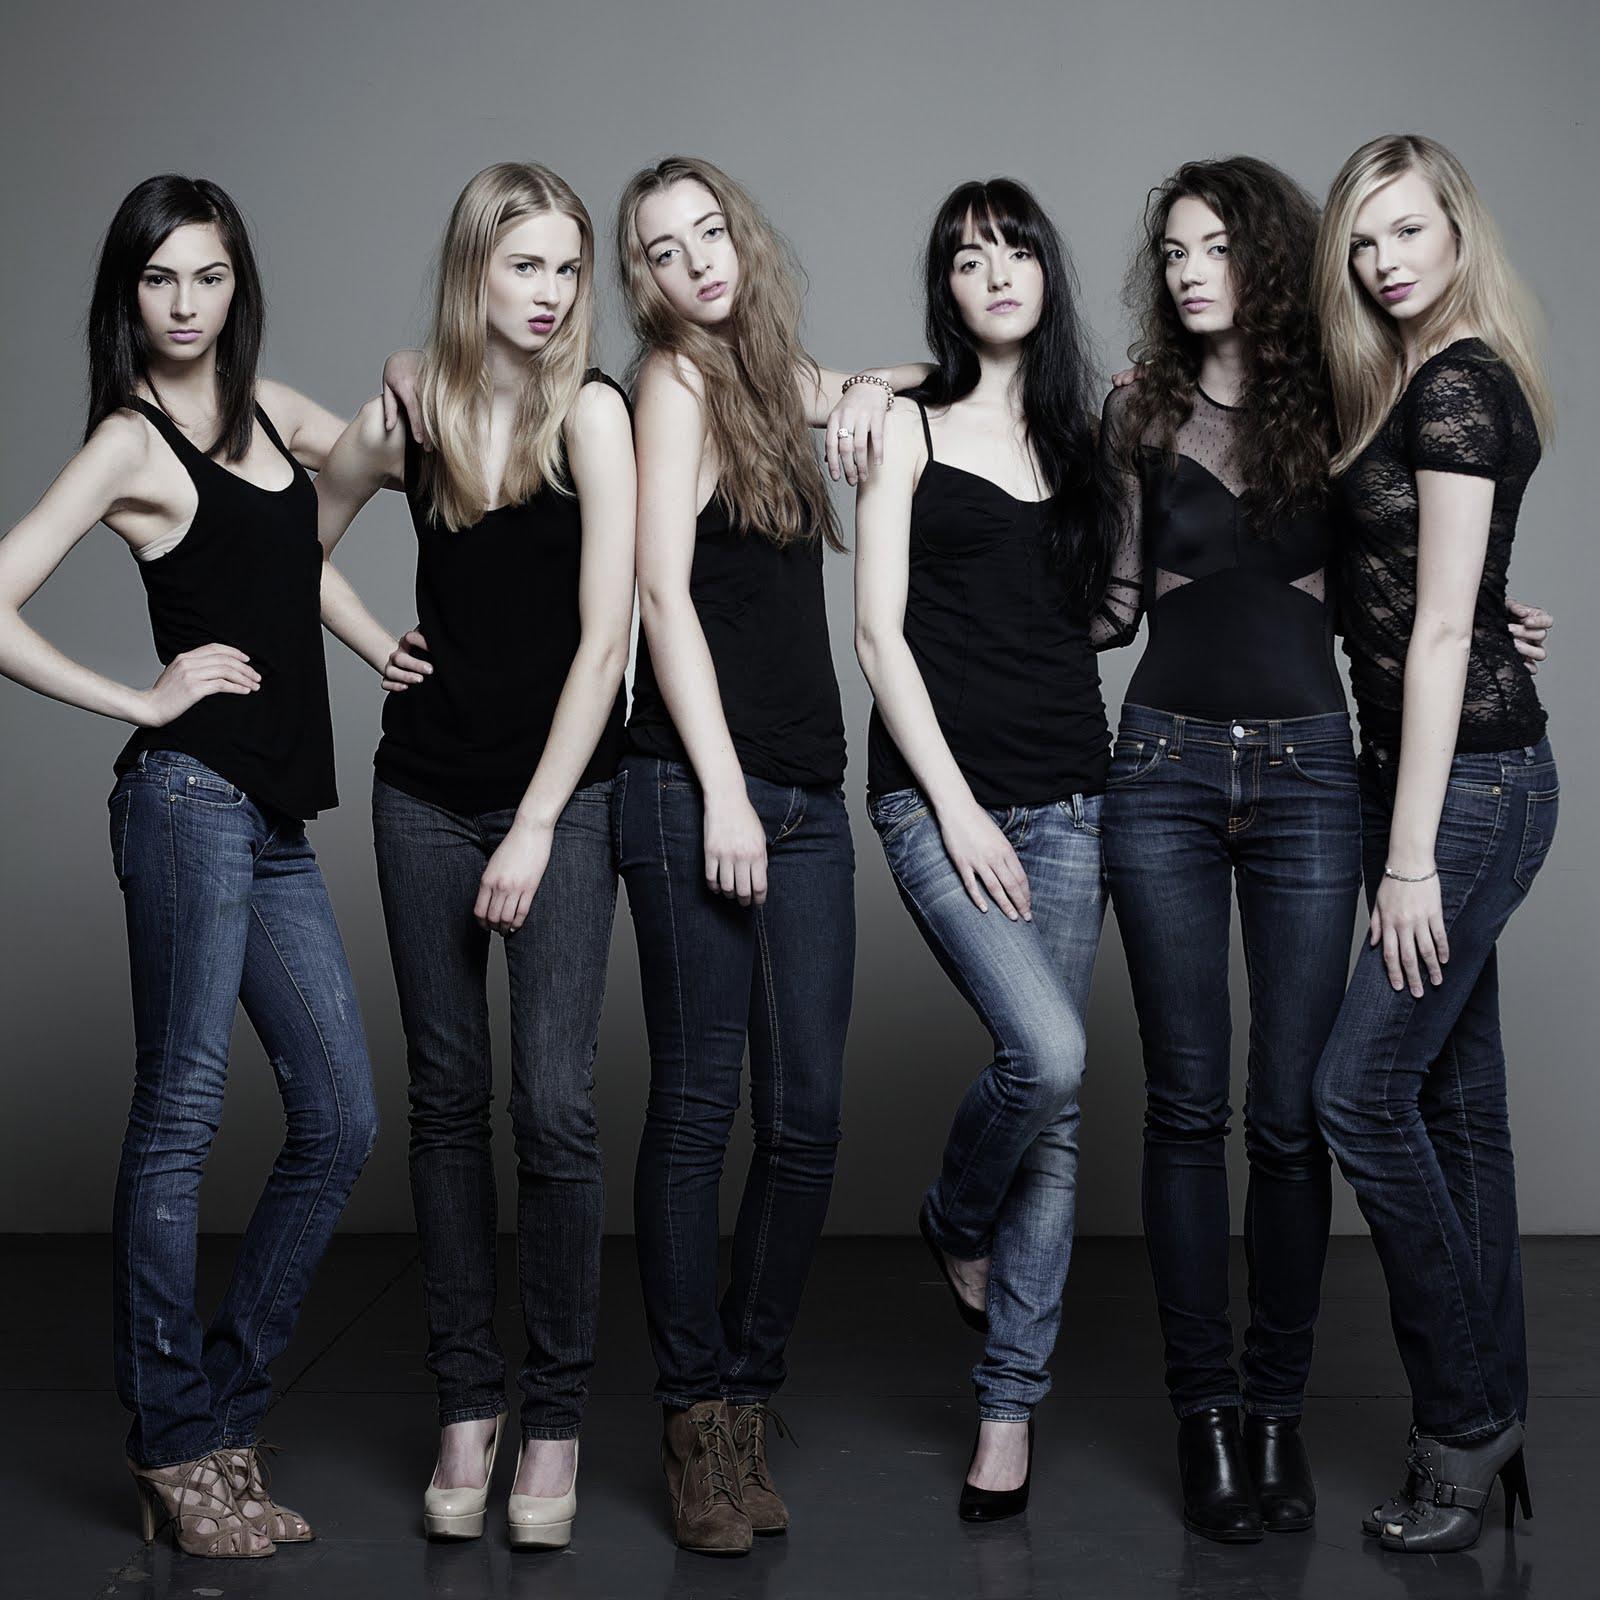 Mode models